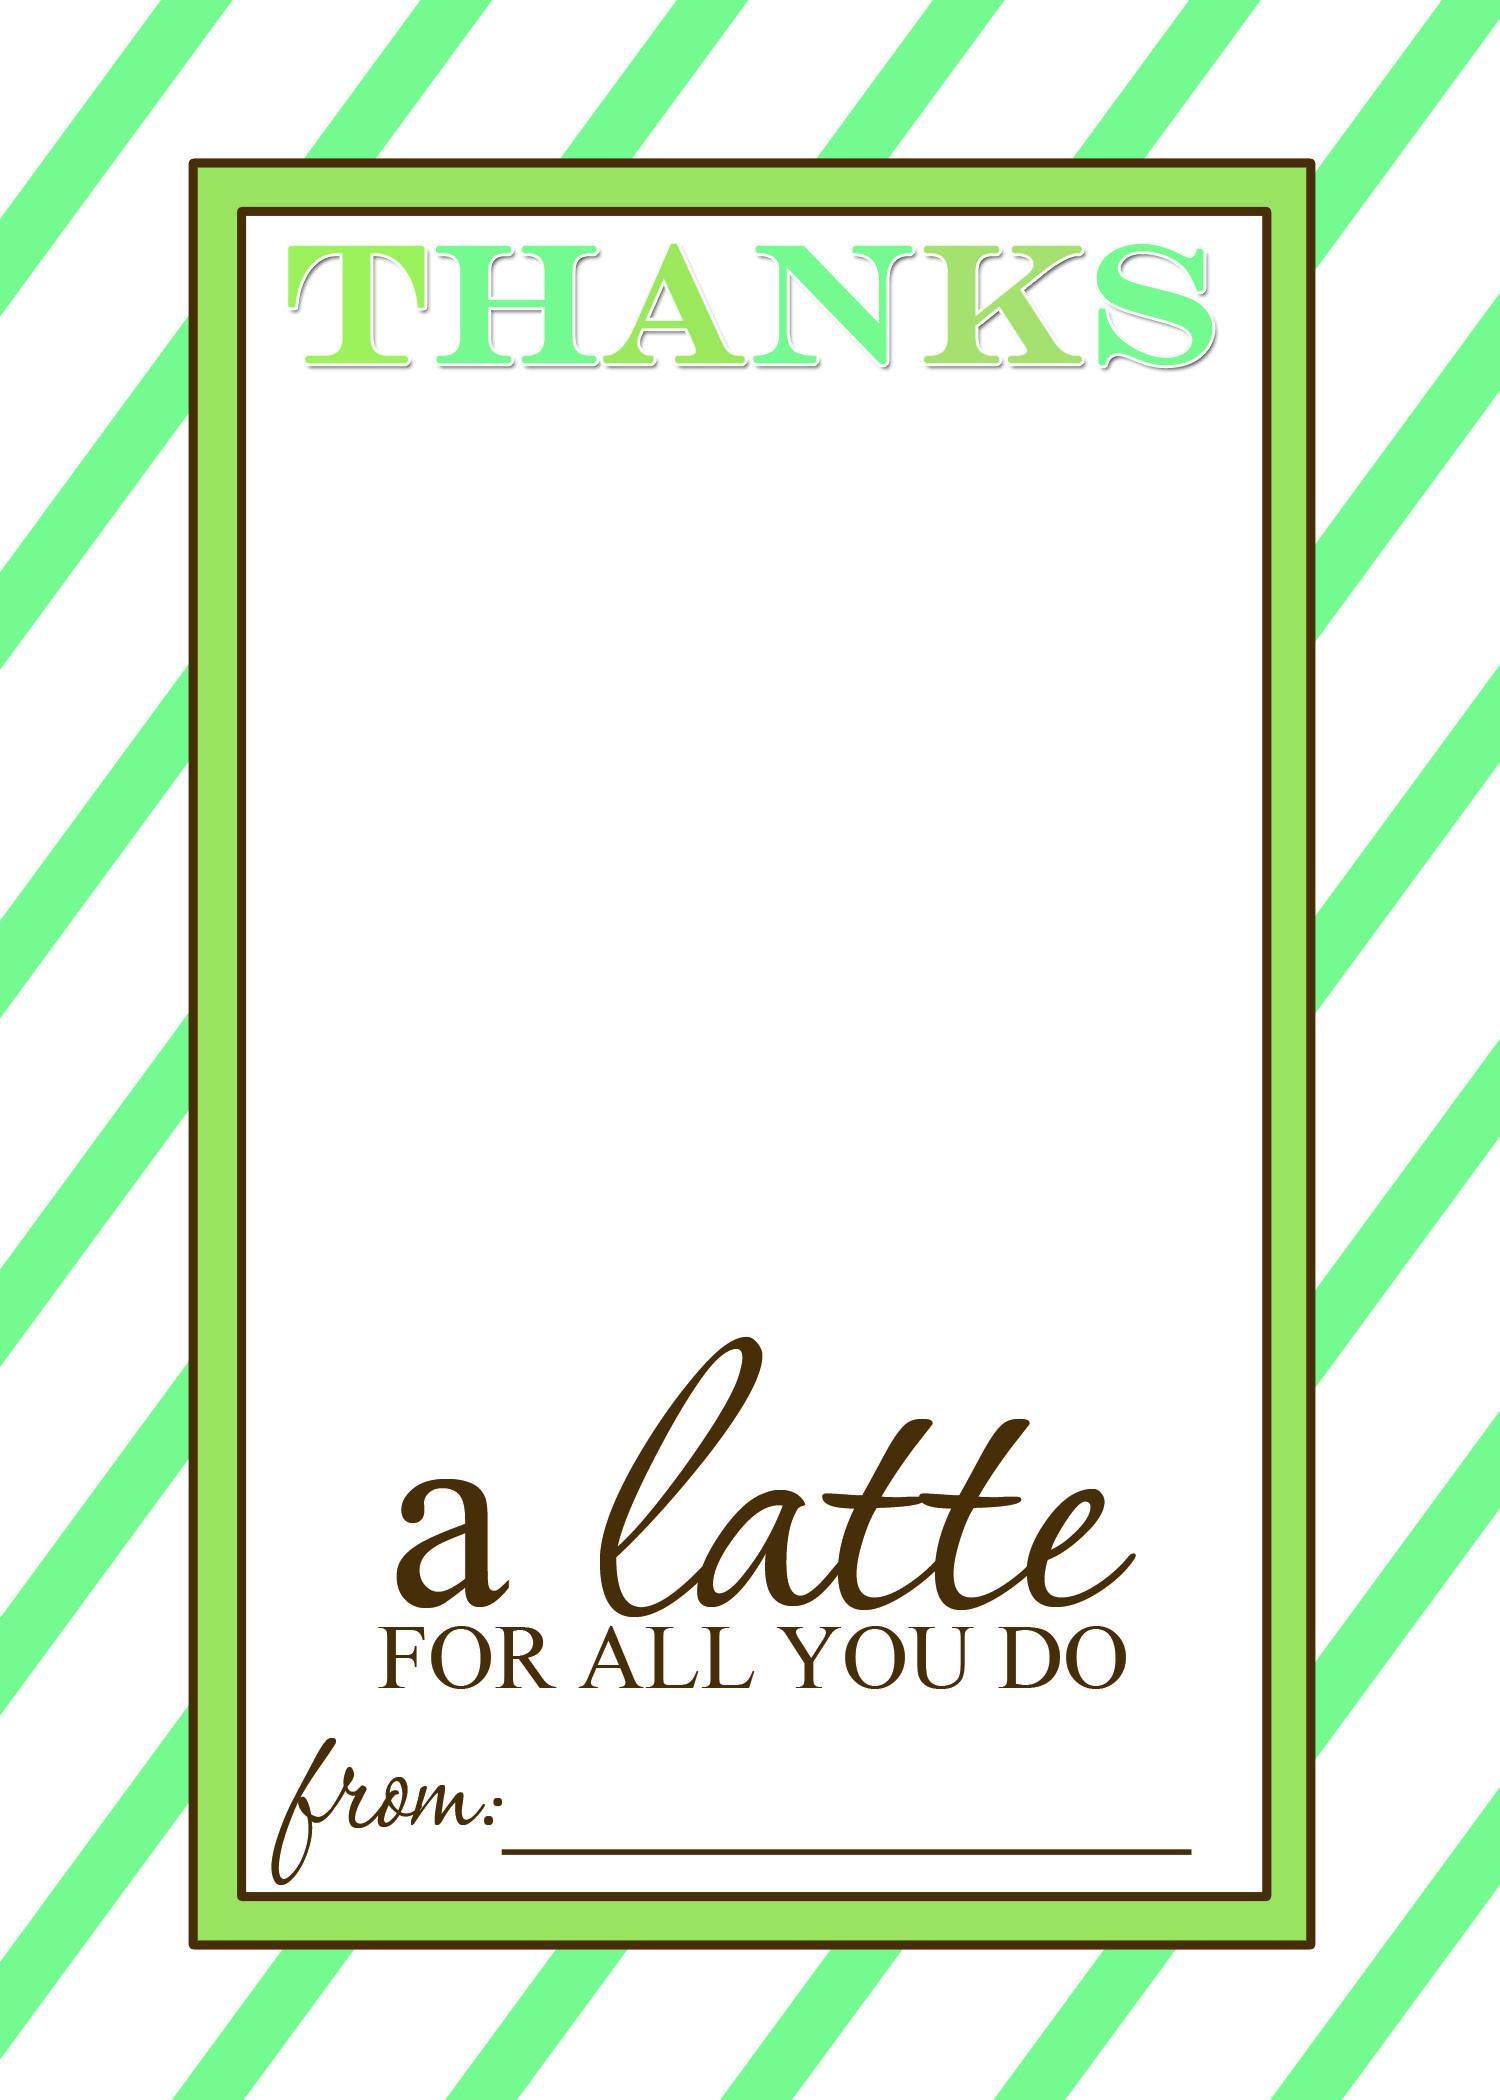 Thanks A Latte Free Printable Gift Card Holder Teacher Gift   Craft - Thanks A Latte Free Printable